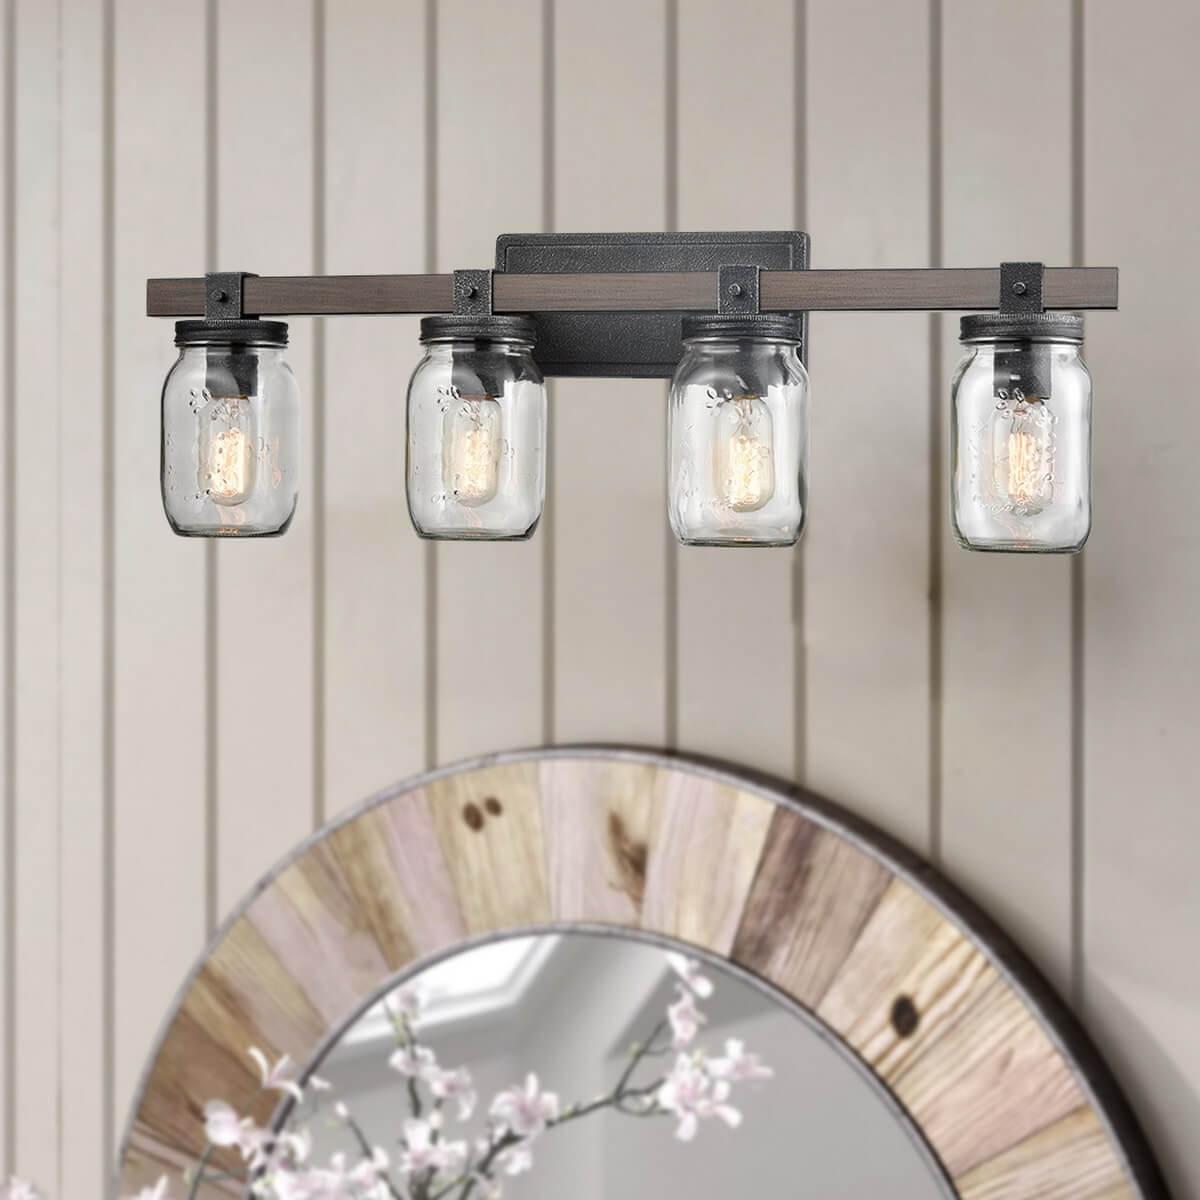 Mason Jar Glass Wall Sconce 4-Light Distressed Bath Vanity Lights